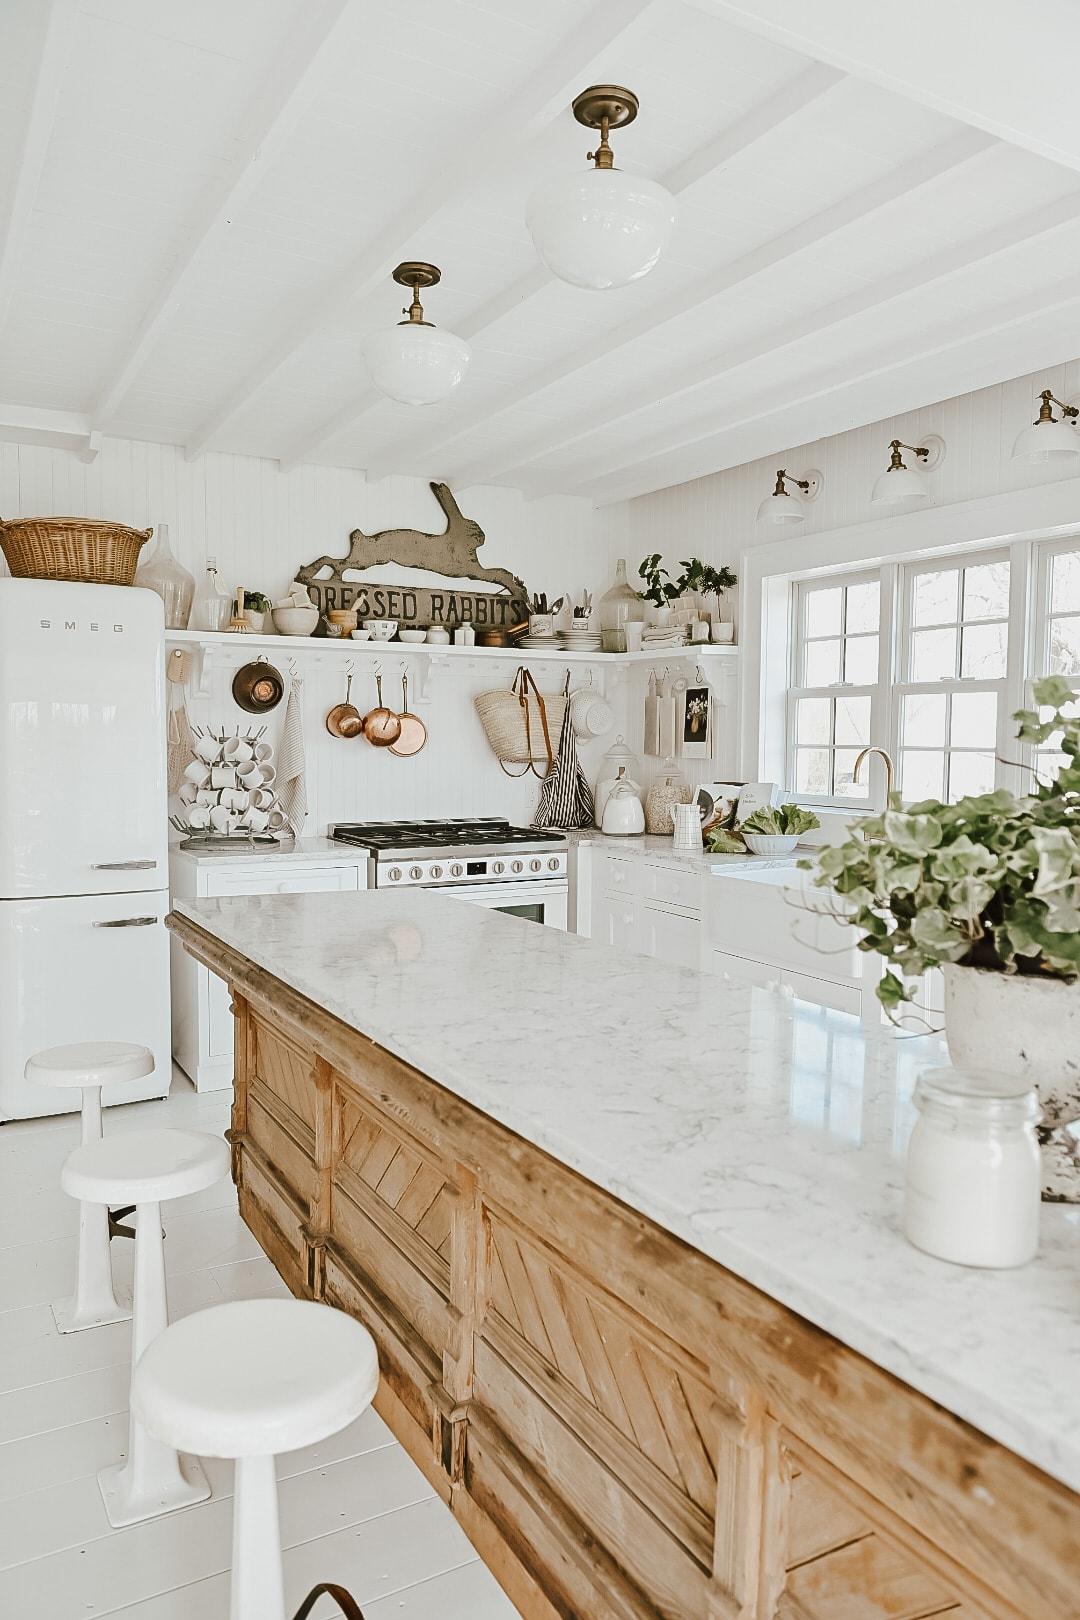 A white farmhouse style kitchen with an antique countertop island.